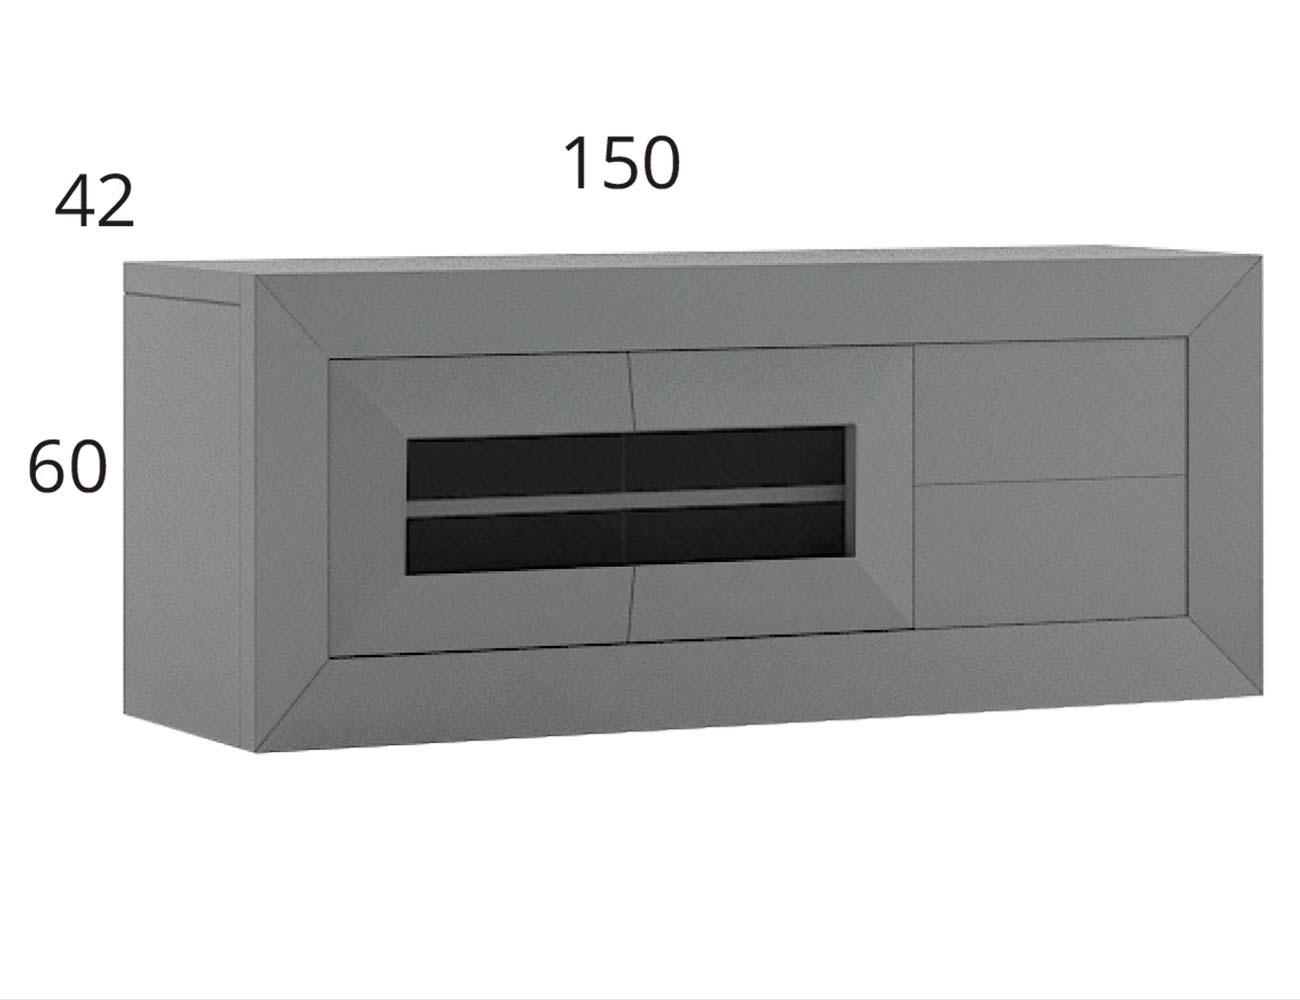 A0661